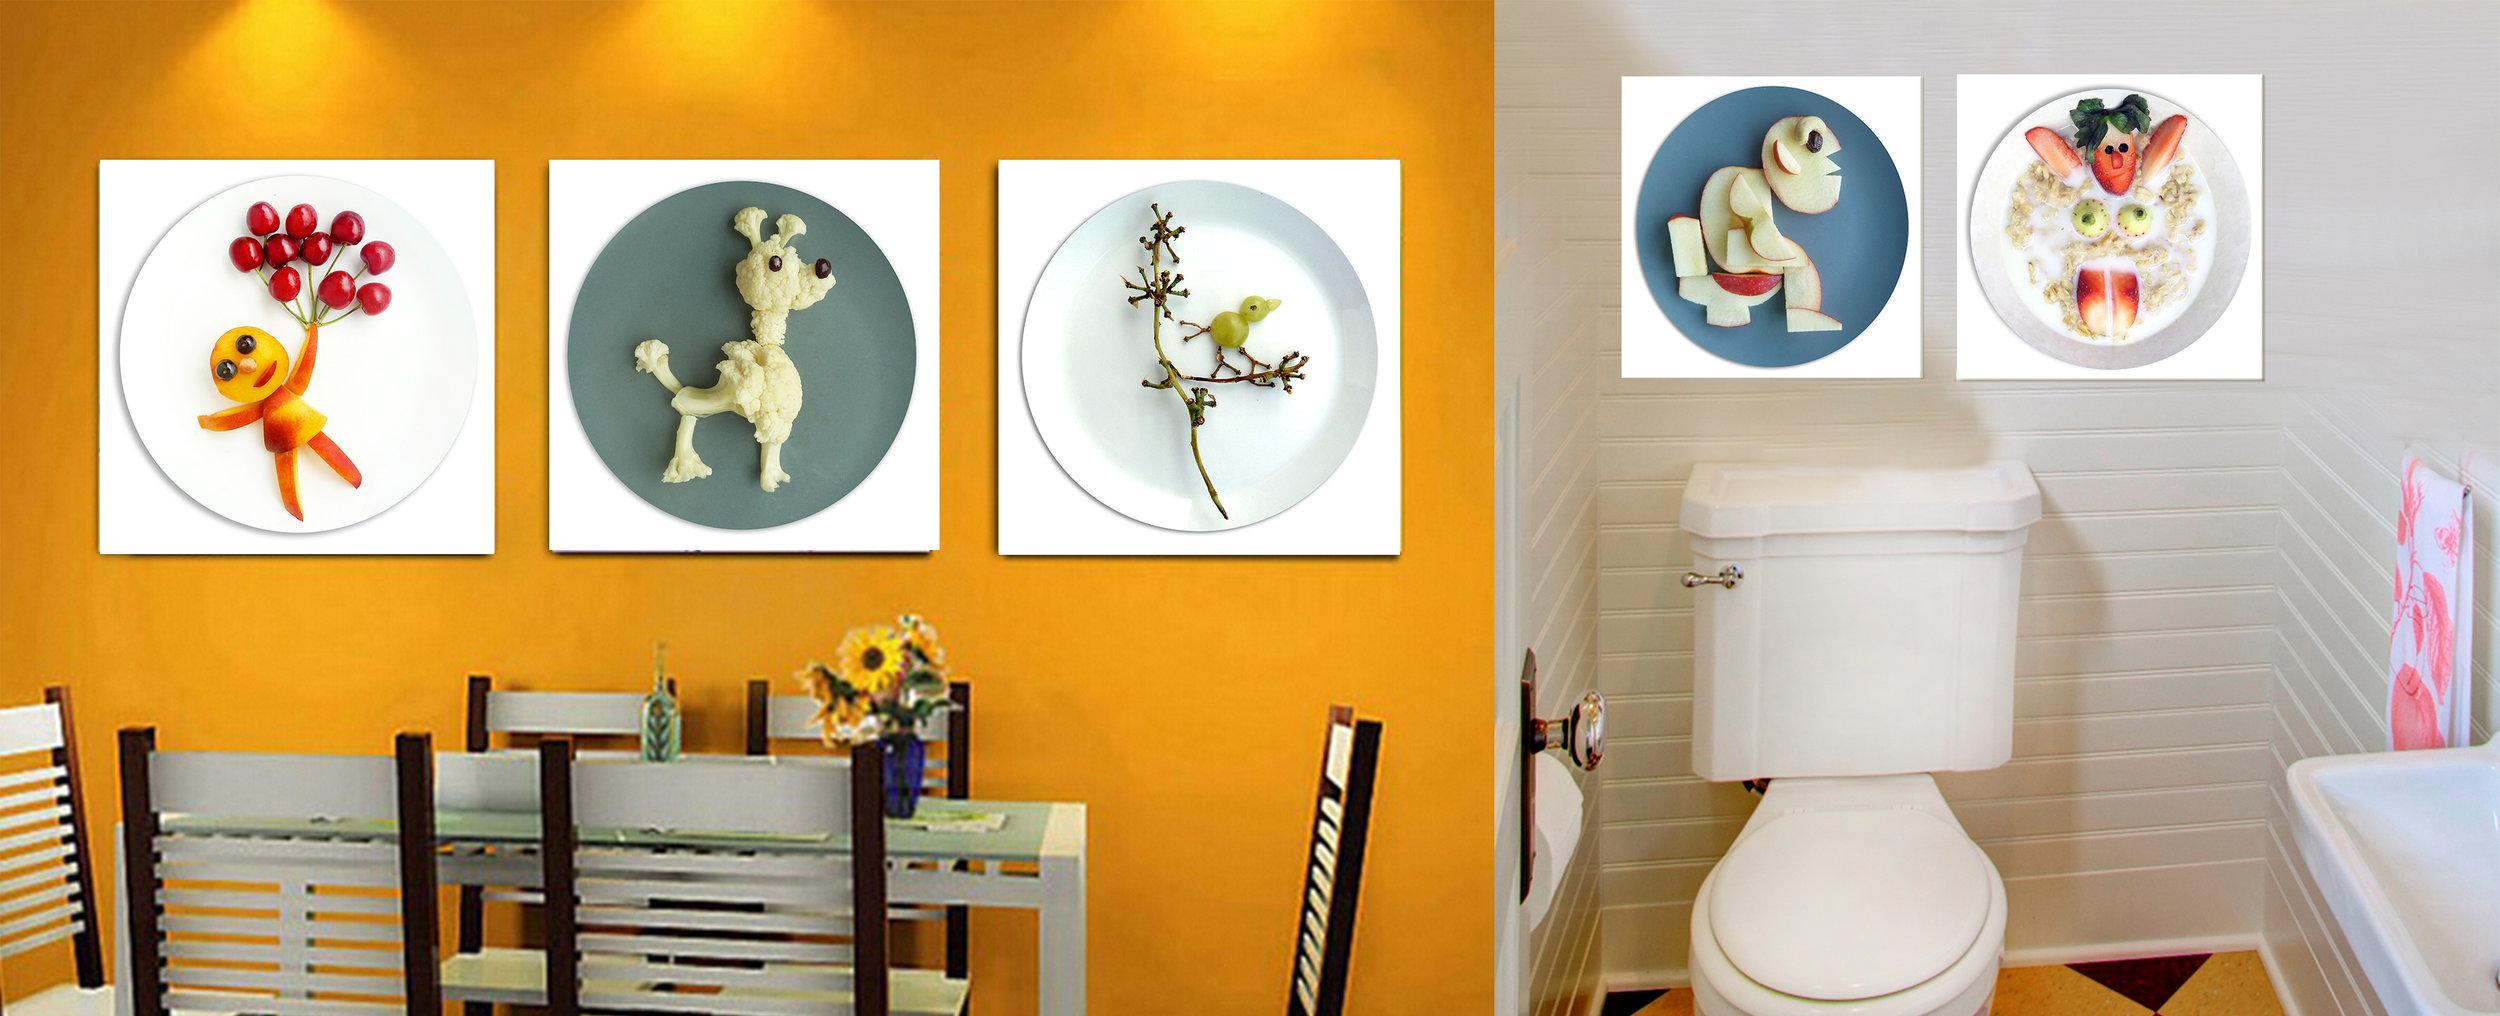 Bath-Dining panel.jpg